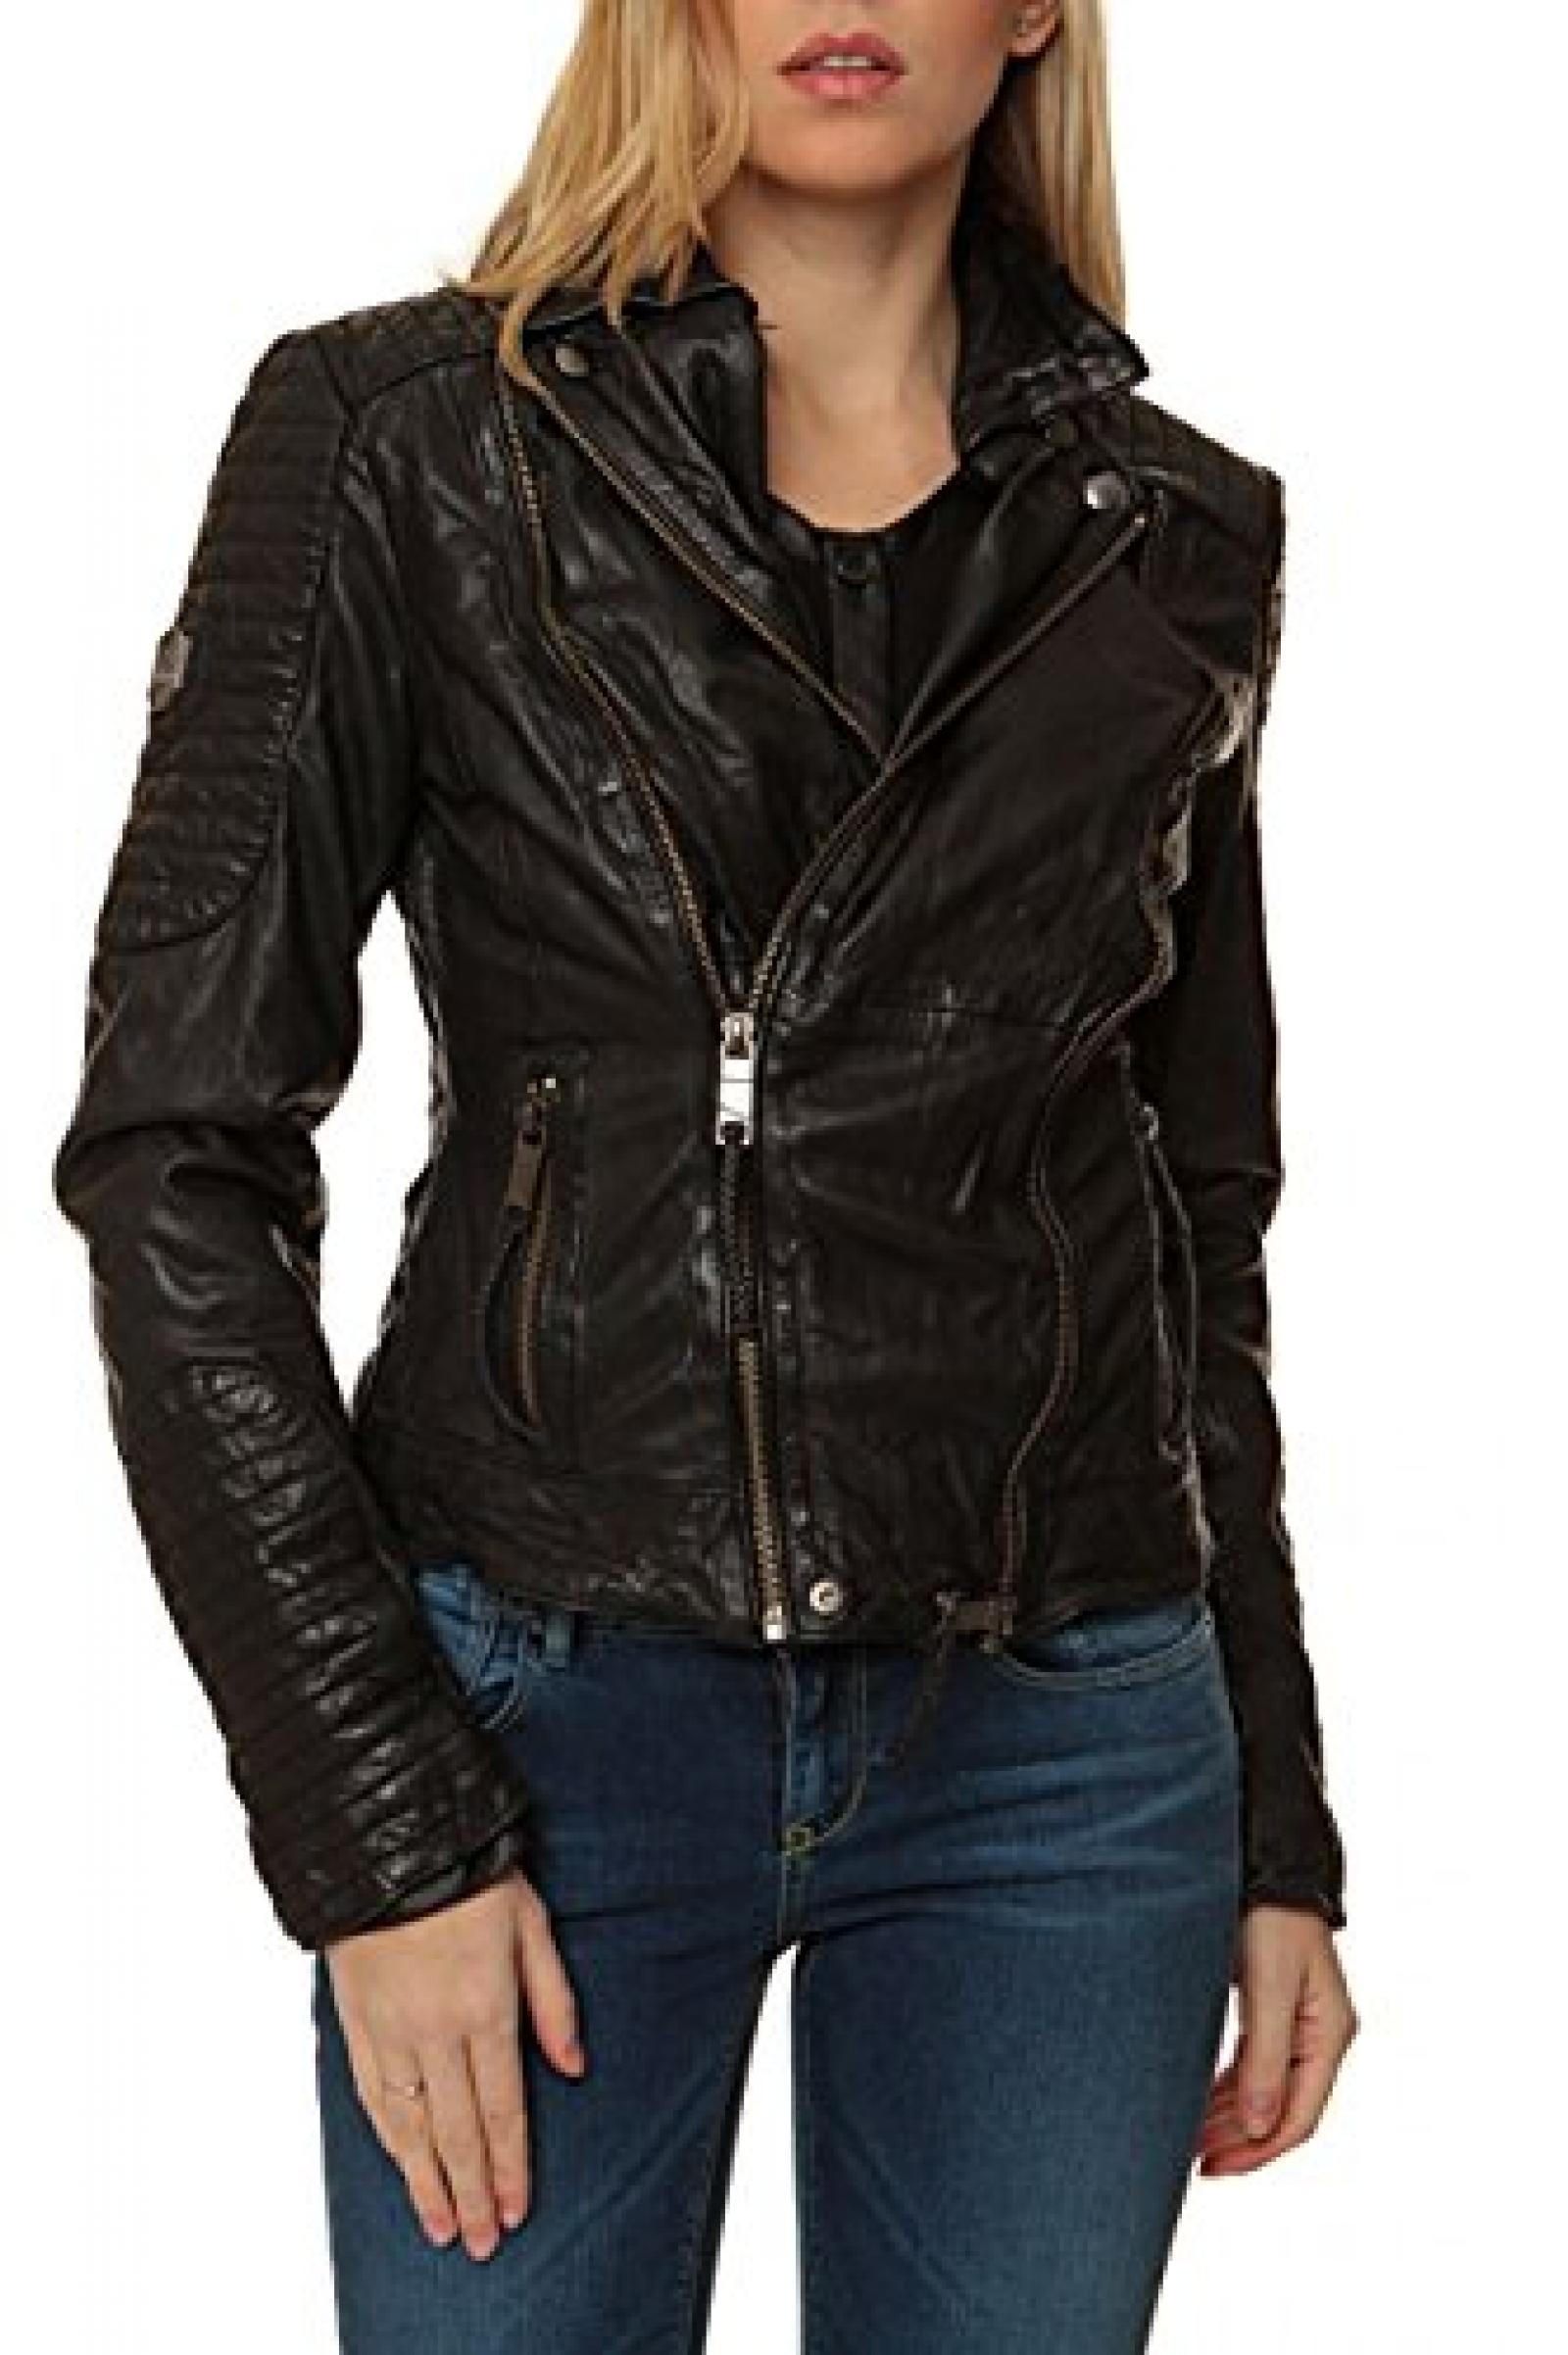 Maze Damen Jacke Lederjacke , Farbe: Schwarz